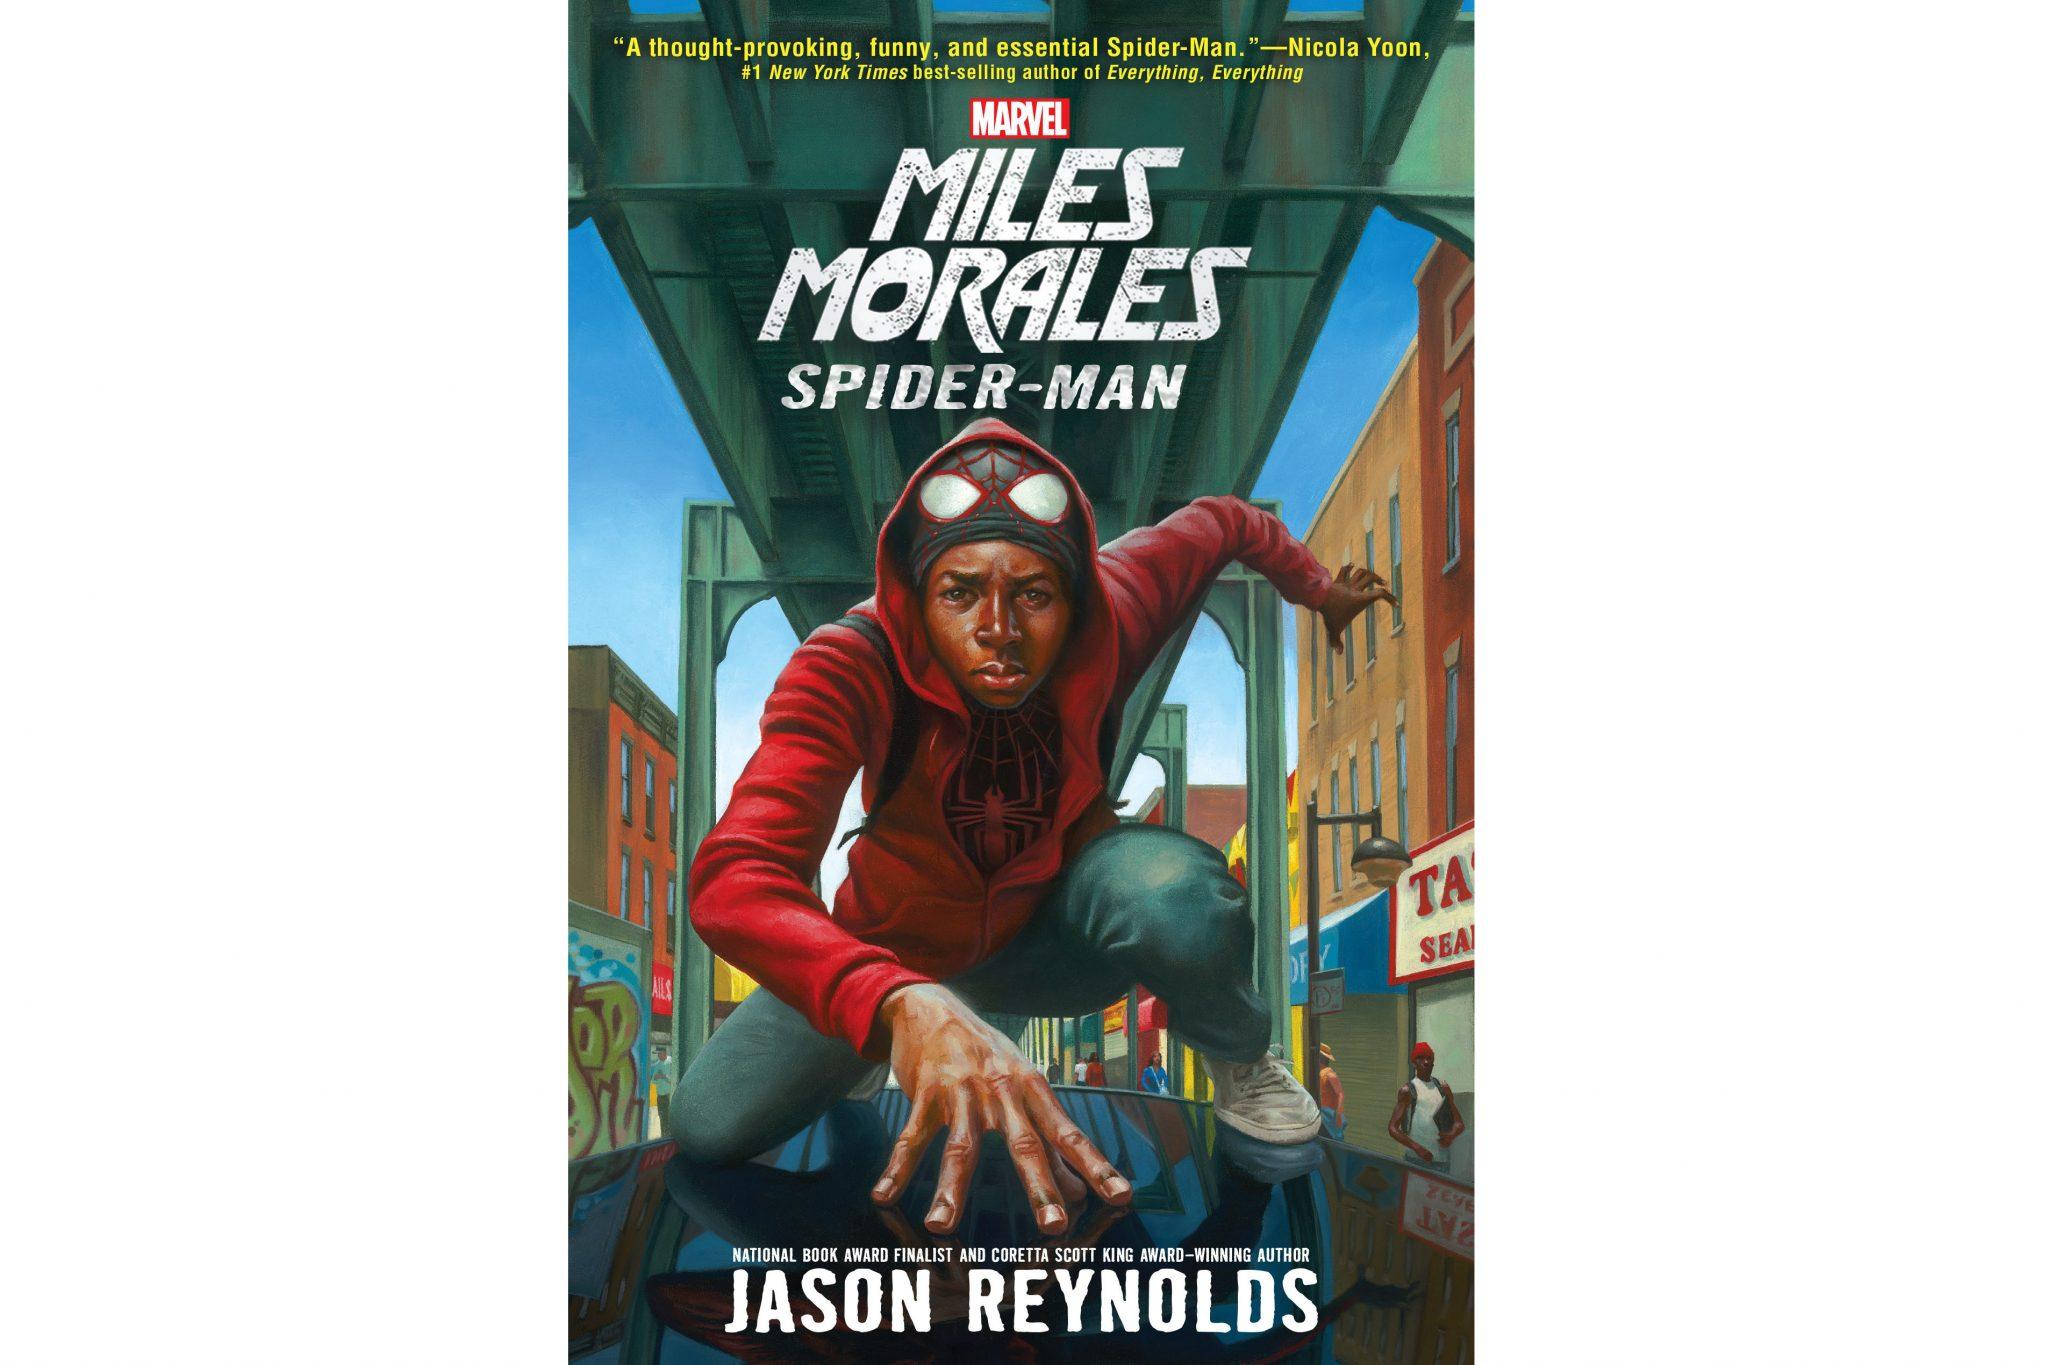 'Miles Morales: Spider-Man'